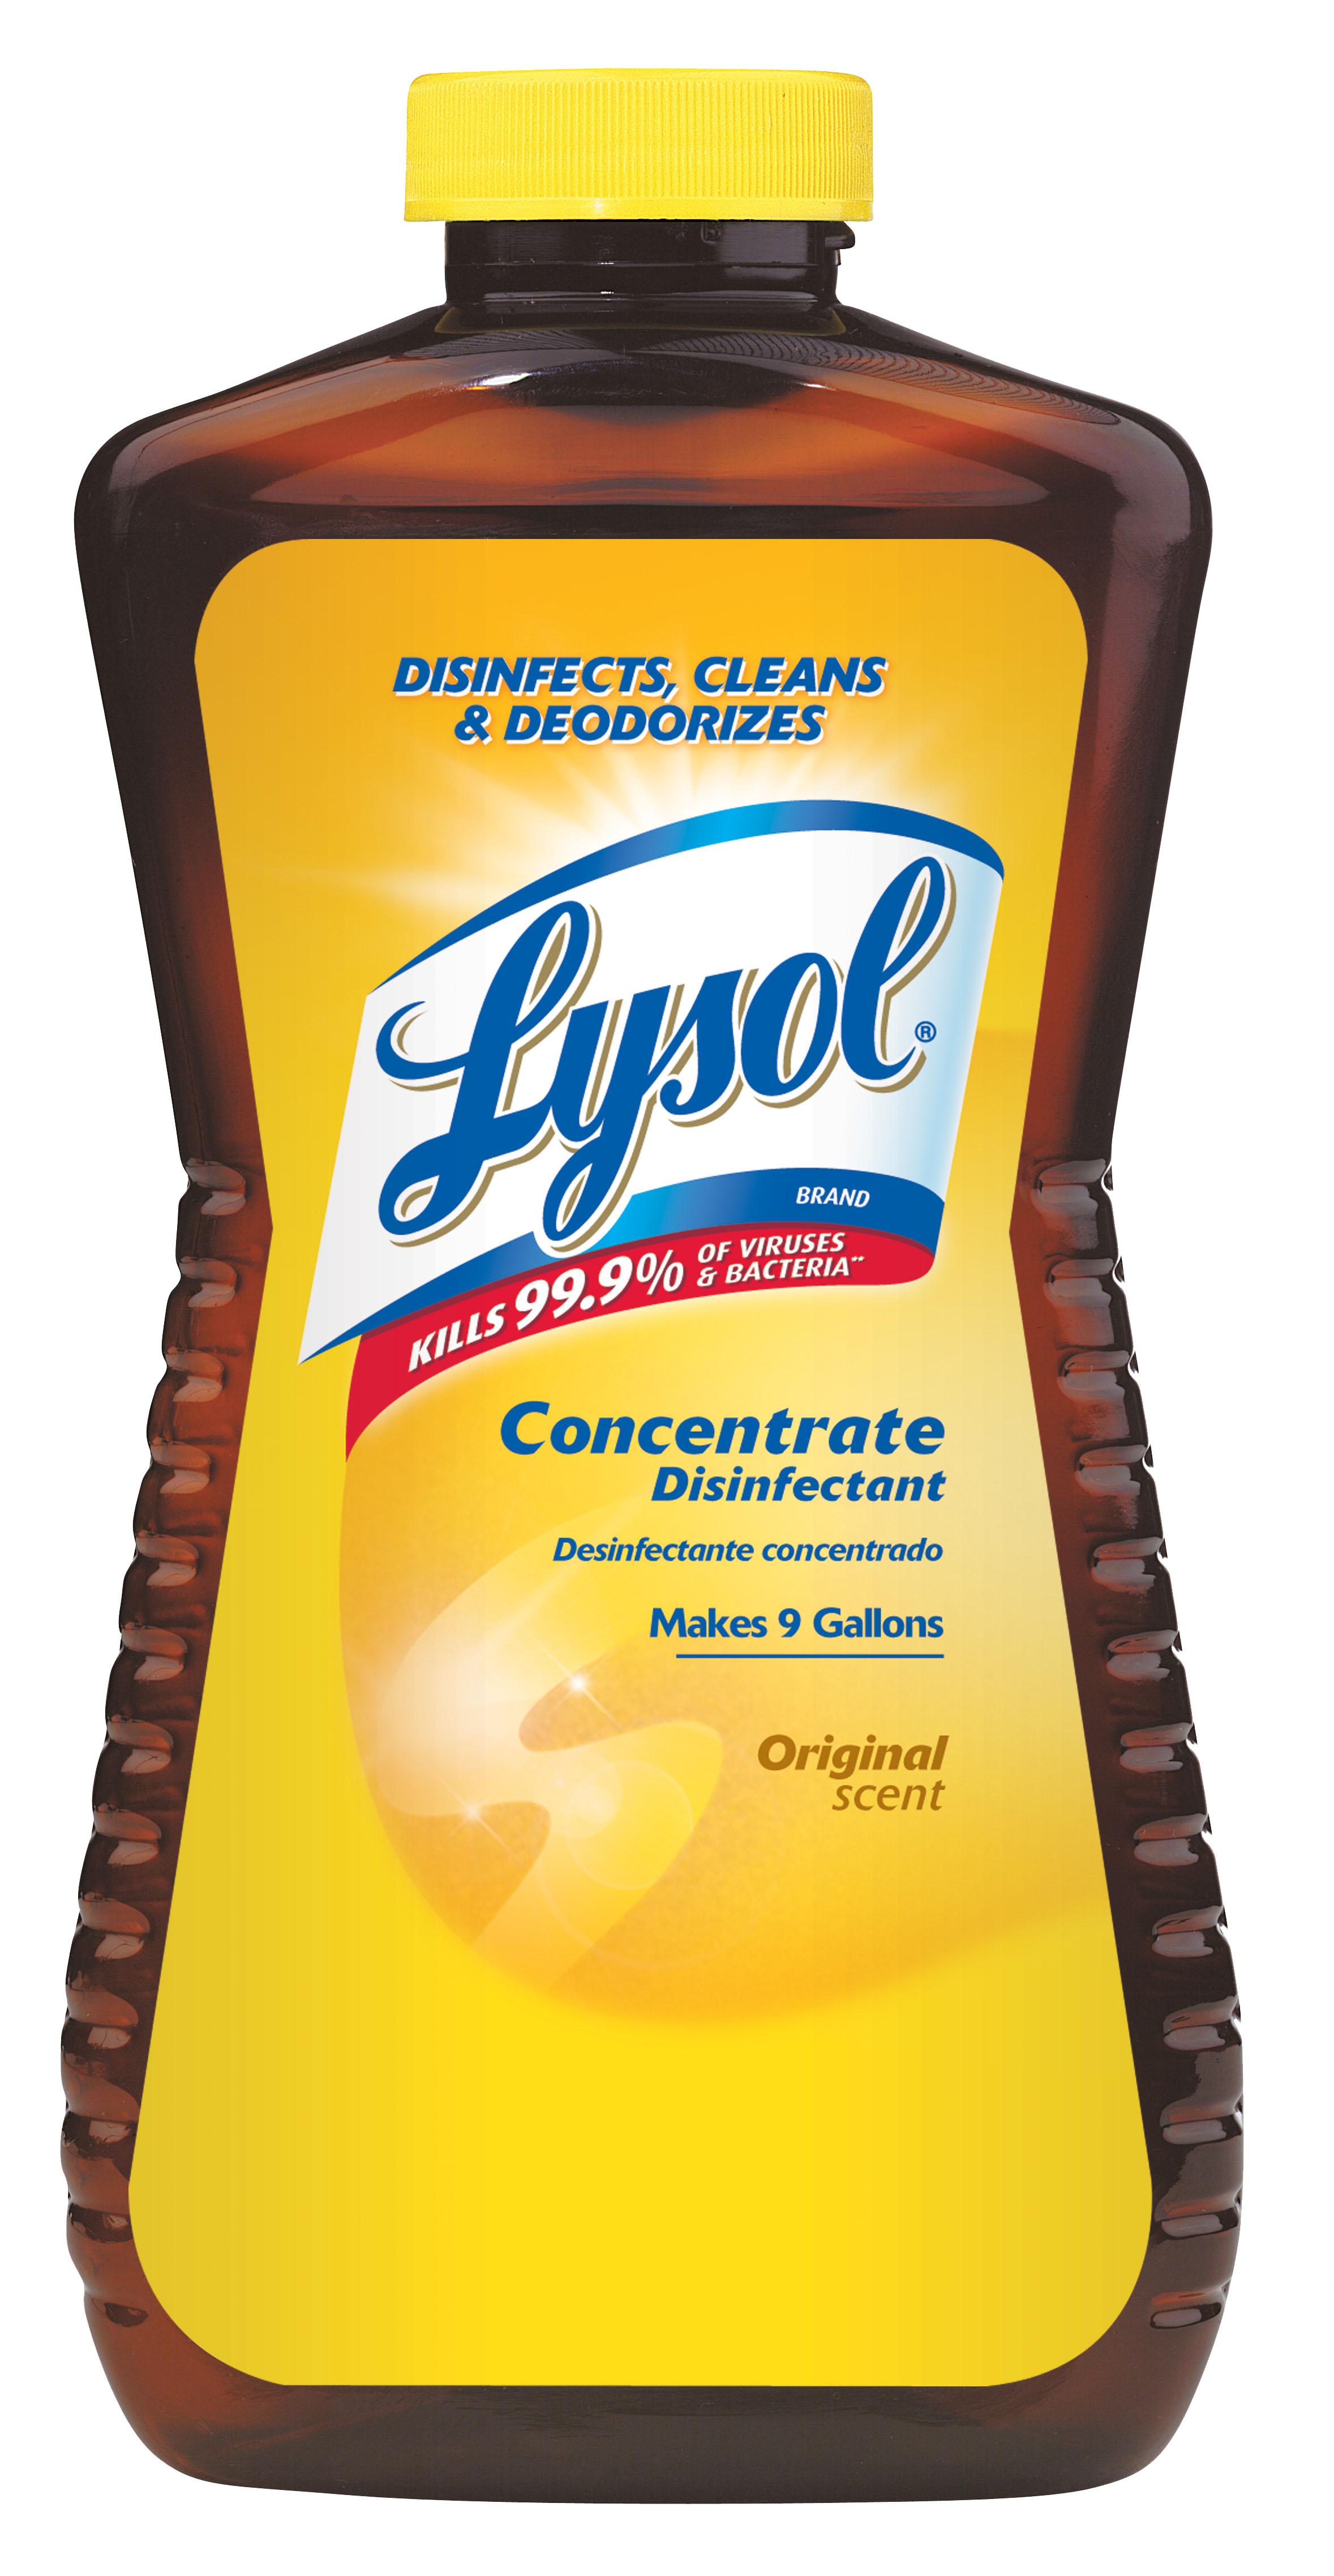 Lysol Disinfectant Concentrate Original Scent, 12oz